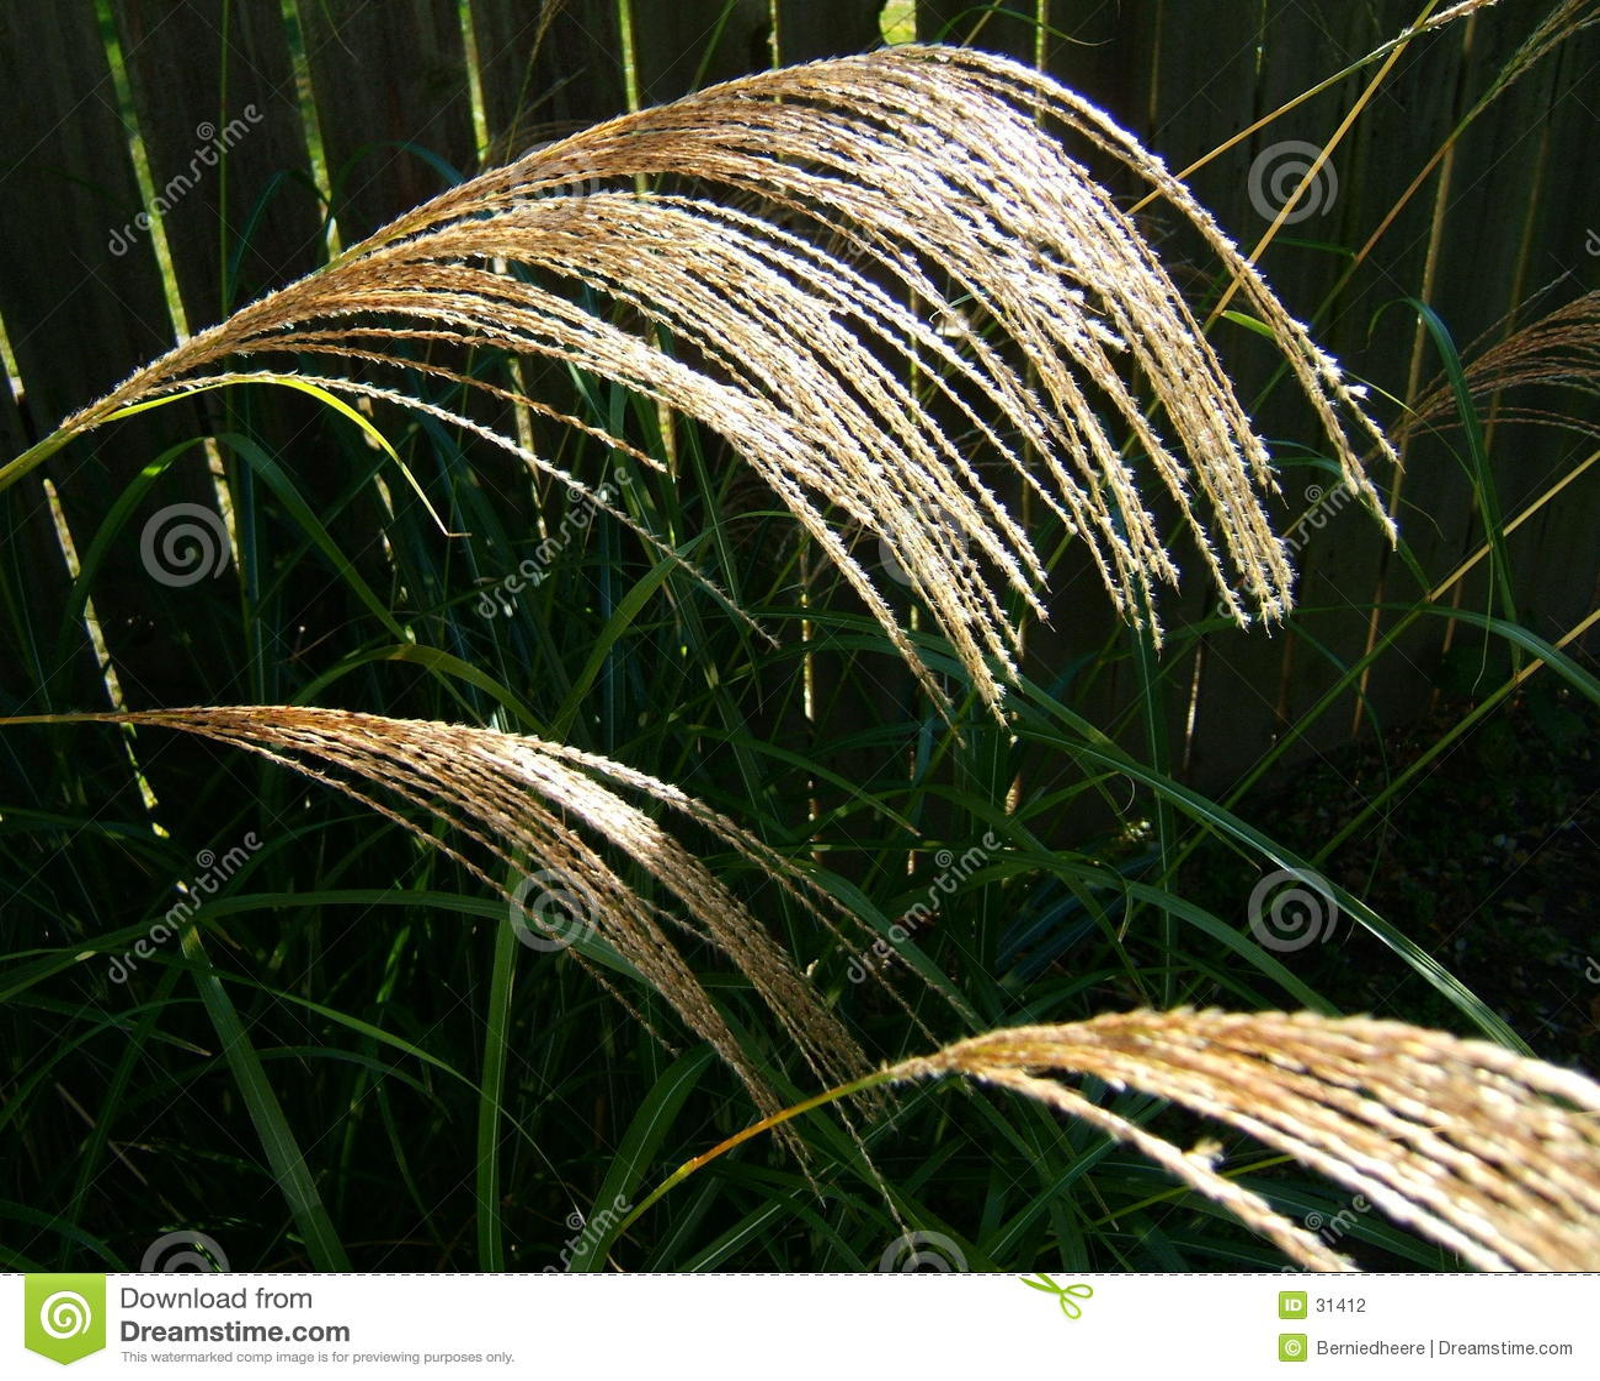 Tall Grass Seed Heads